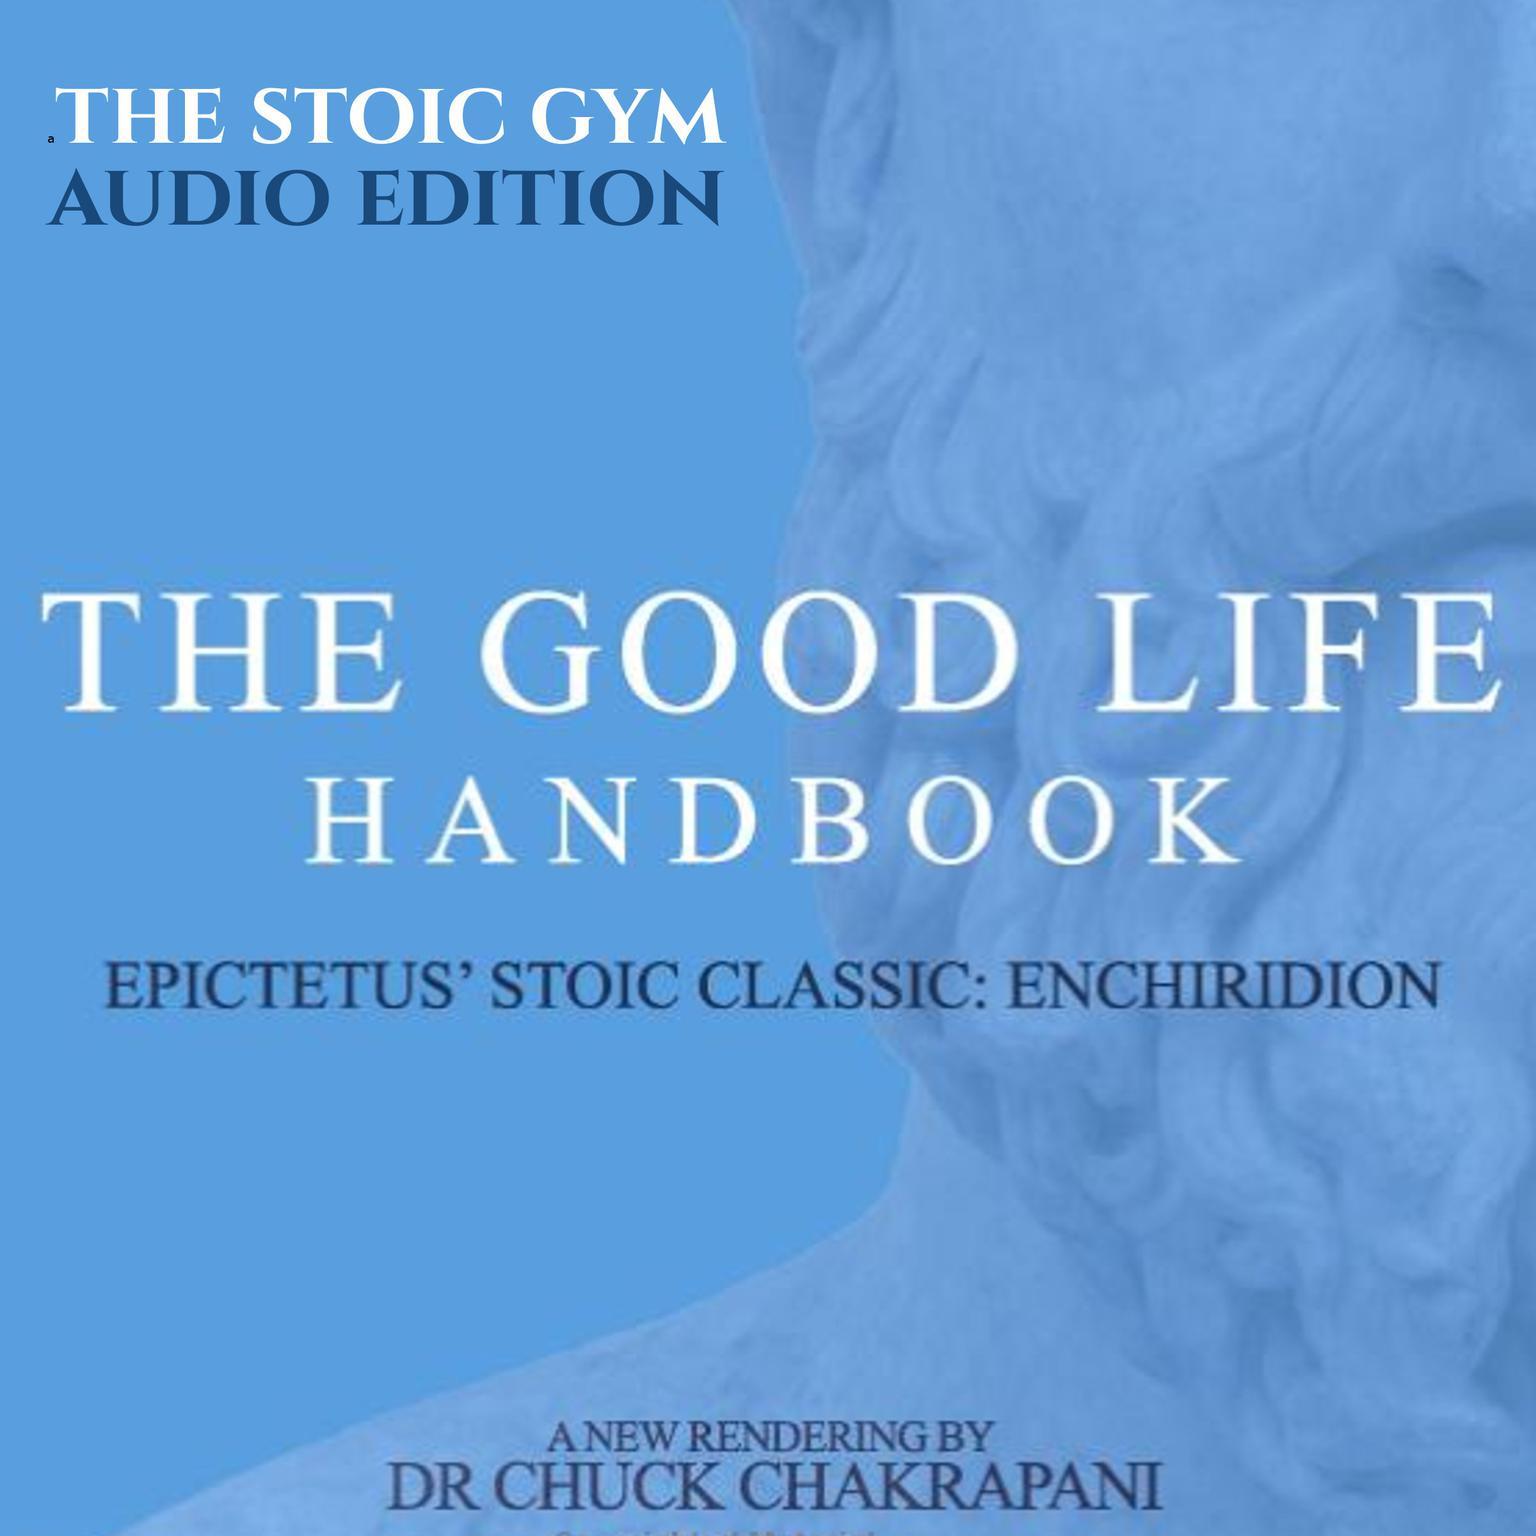 The Good Life Handbook: Epictetus' Stoic Classic Enchiridion Audiobook, by Chuck Chakrapani